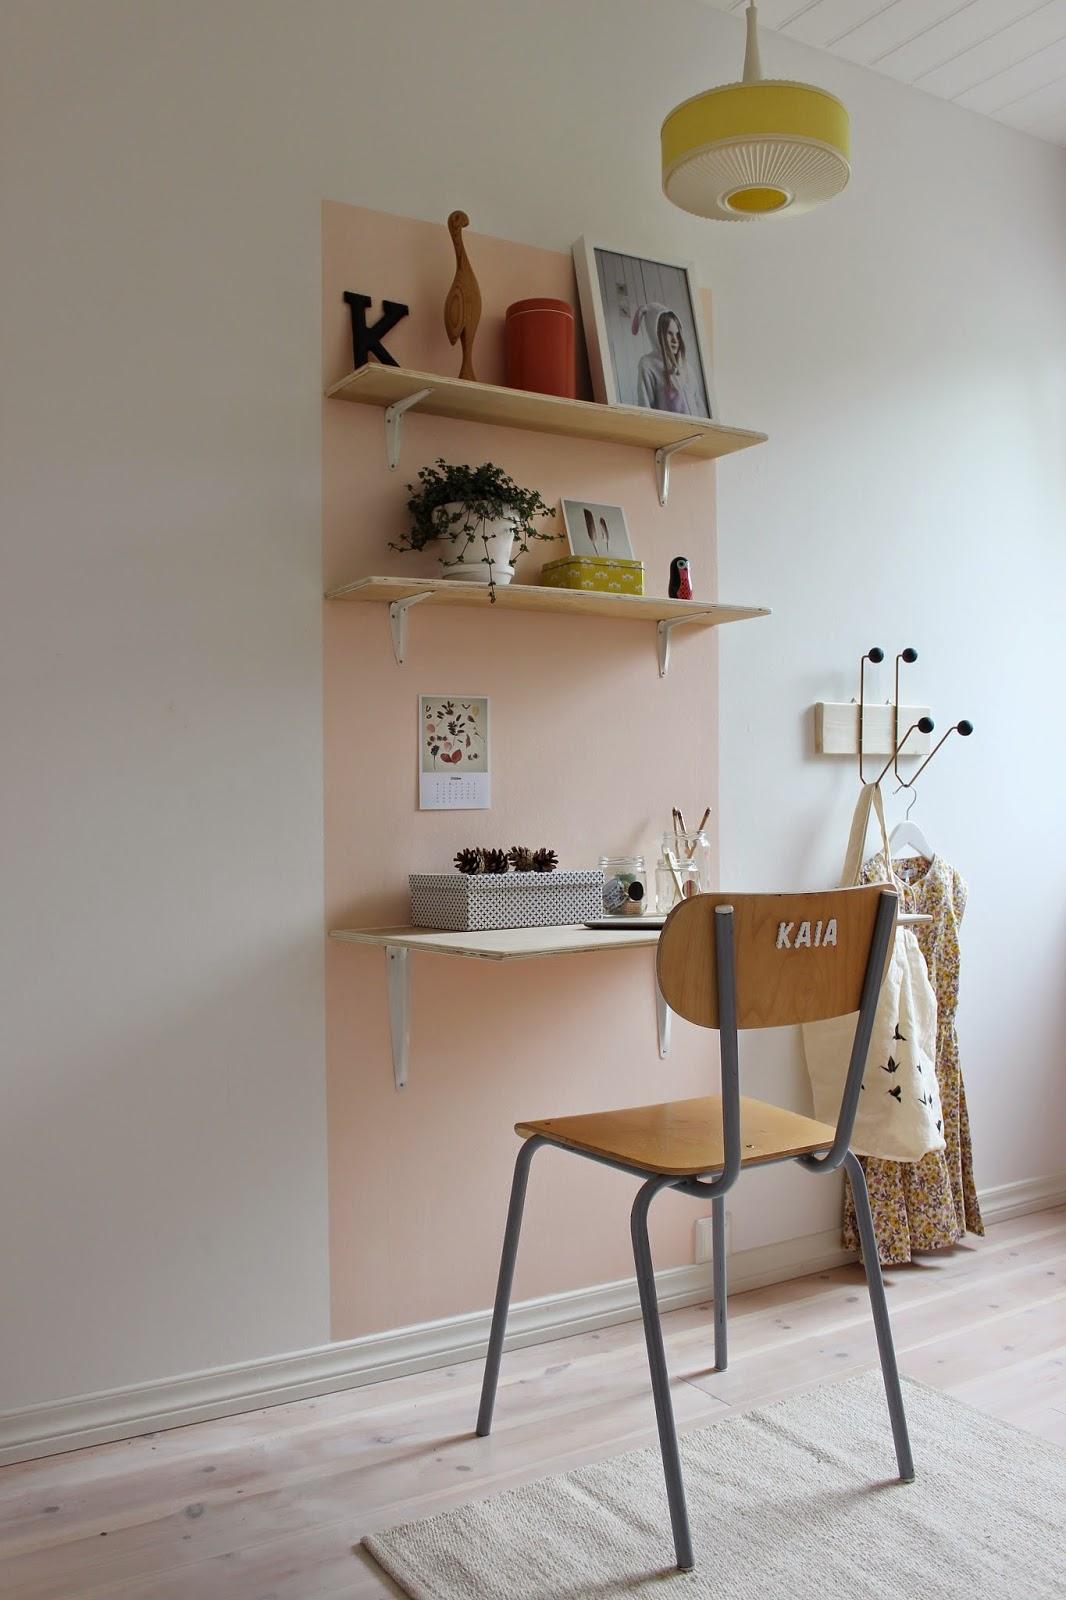 diy un bureau peu cher lili in wonderland. Black Bedroom Furniture Sets. Home Design Ideas